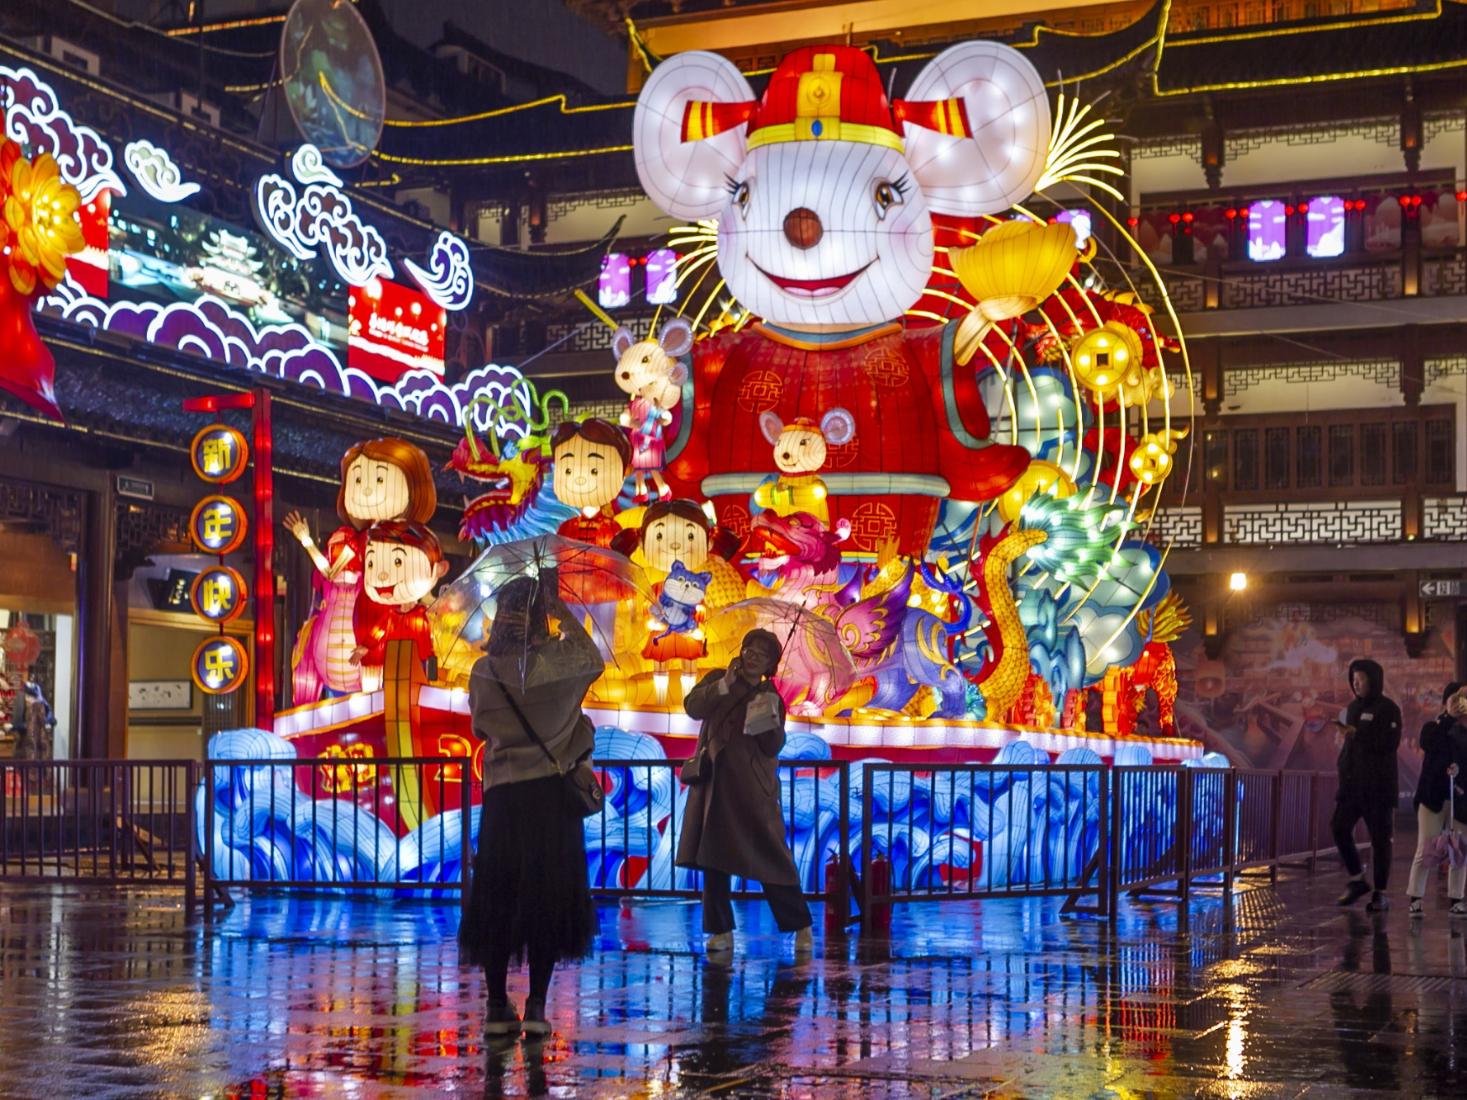 Disney stars debut at Shanghai's lantern show